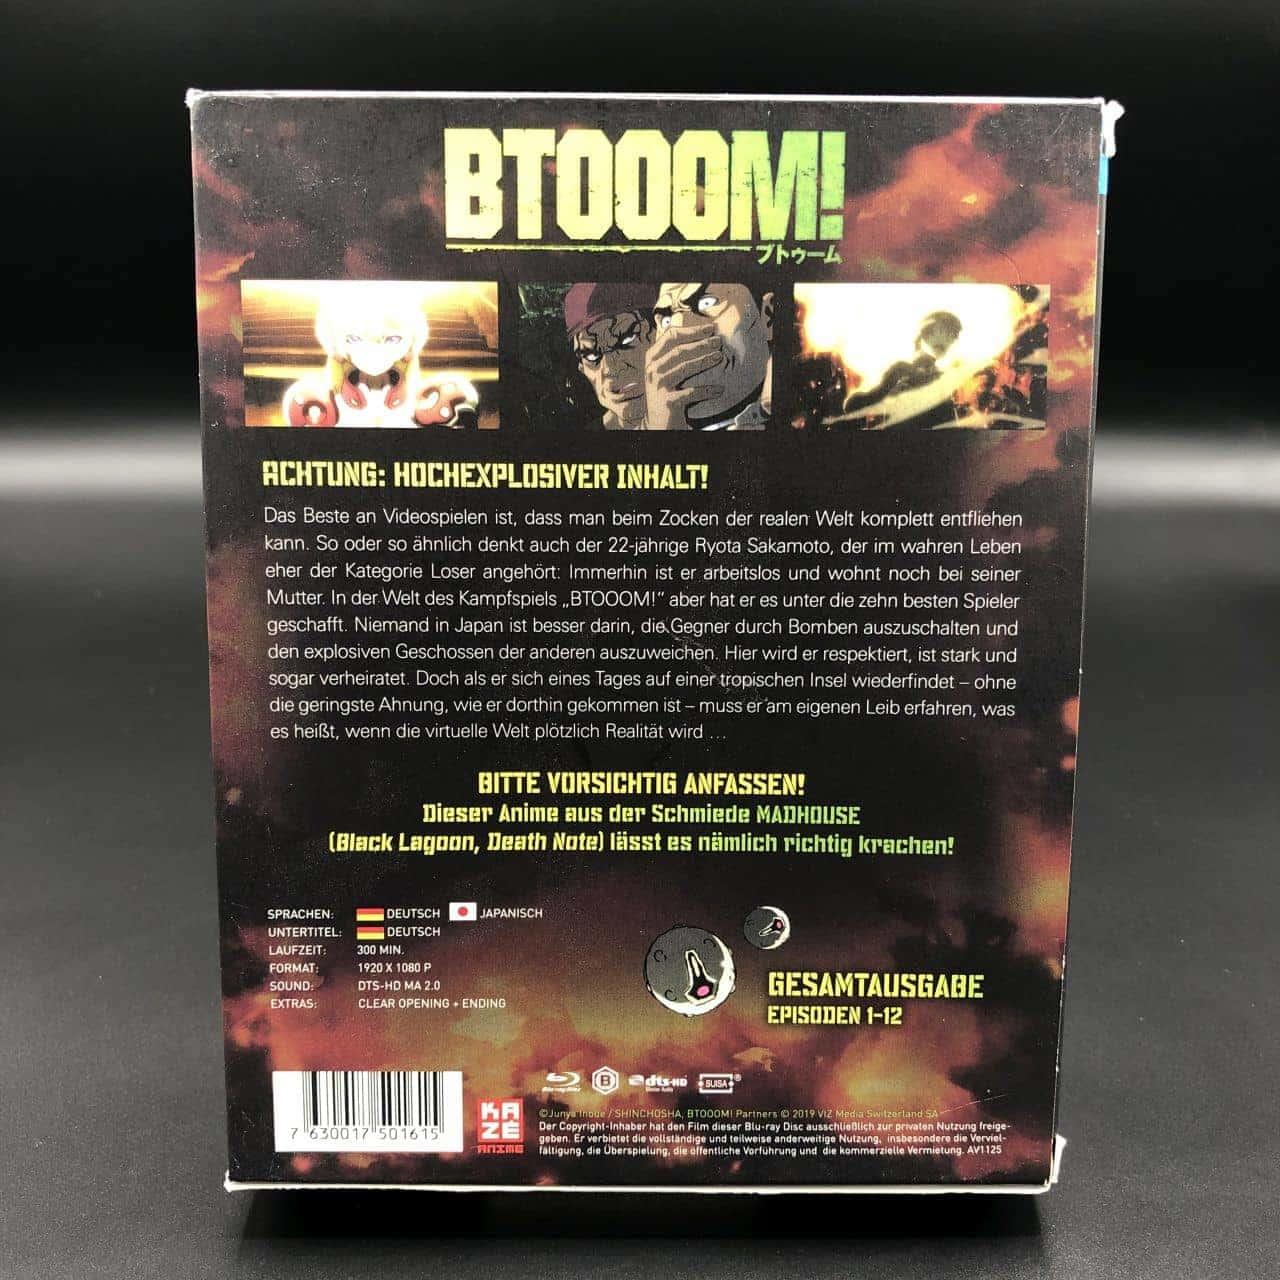 Btooom! (Gesamtausgabe 1-12) (Blu-ray) (Sehr gut) Anime